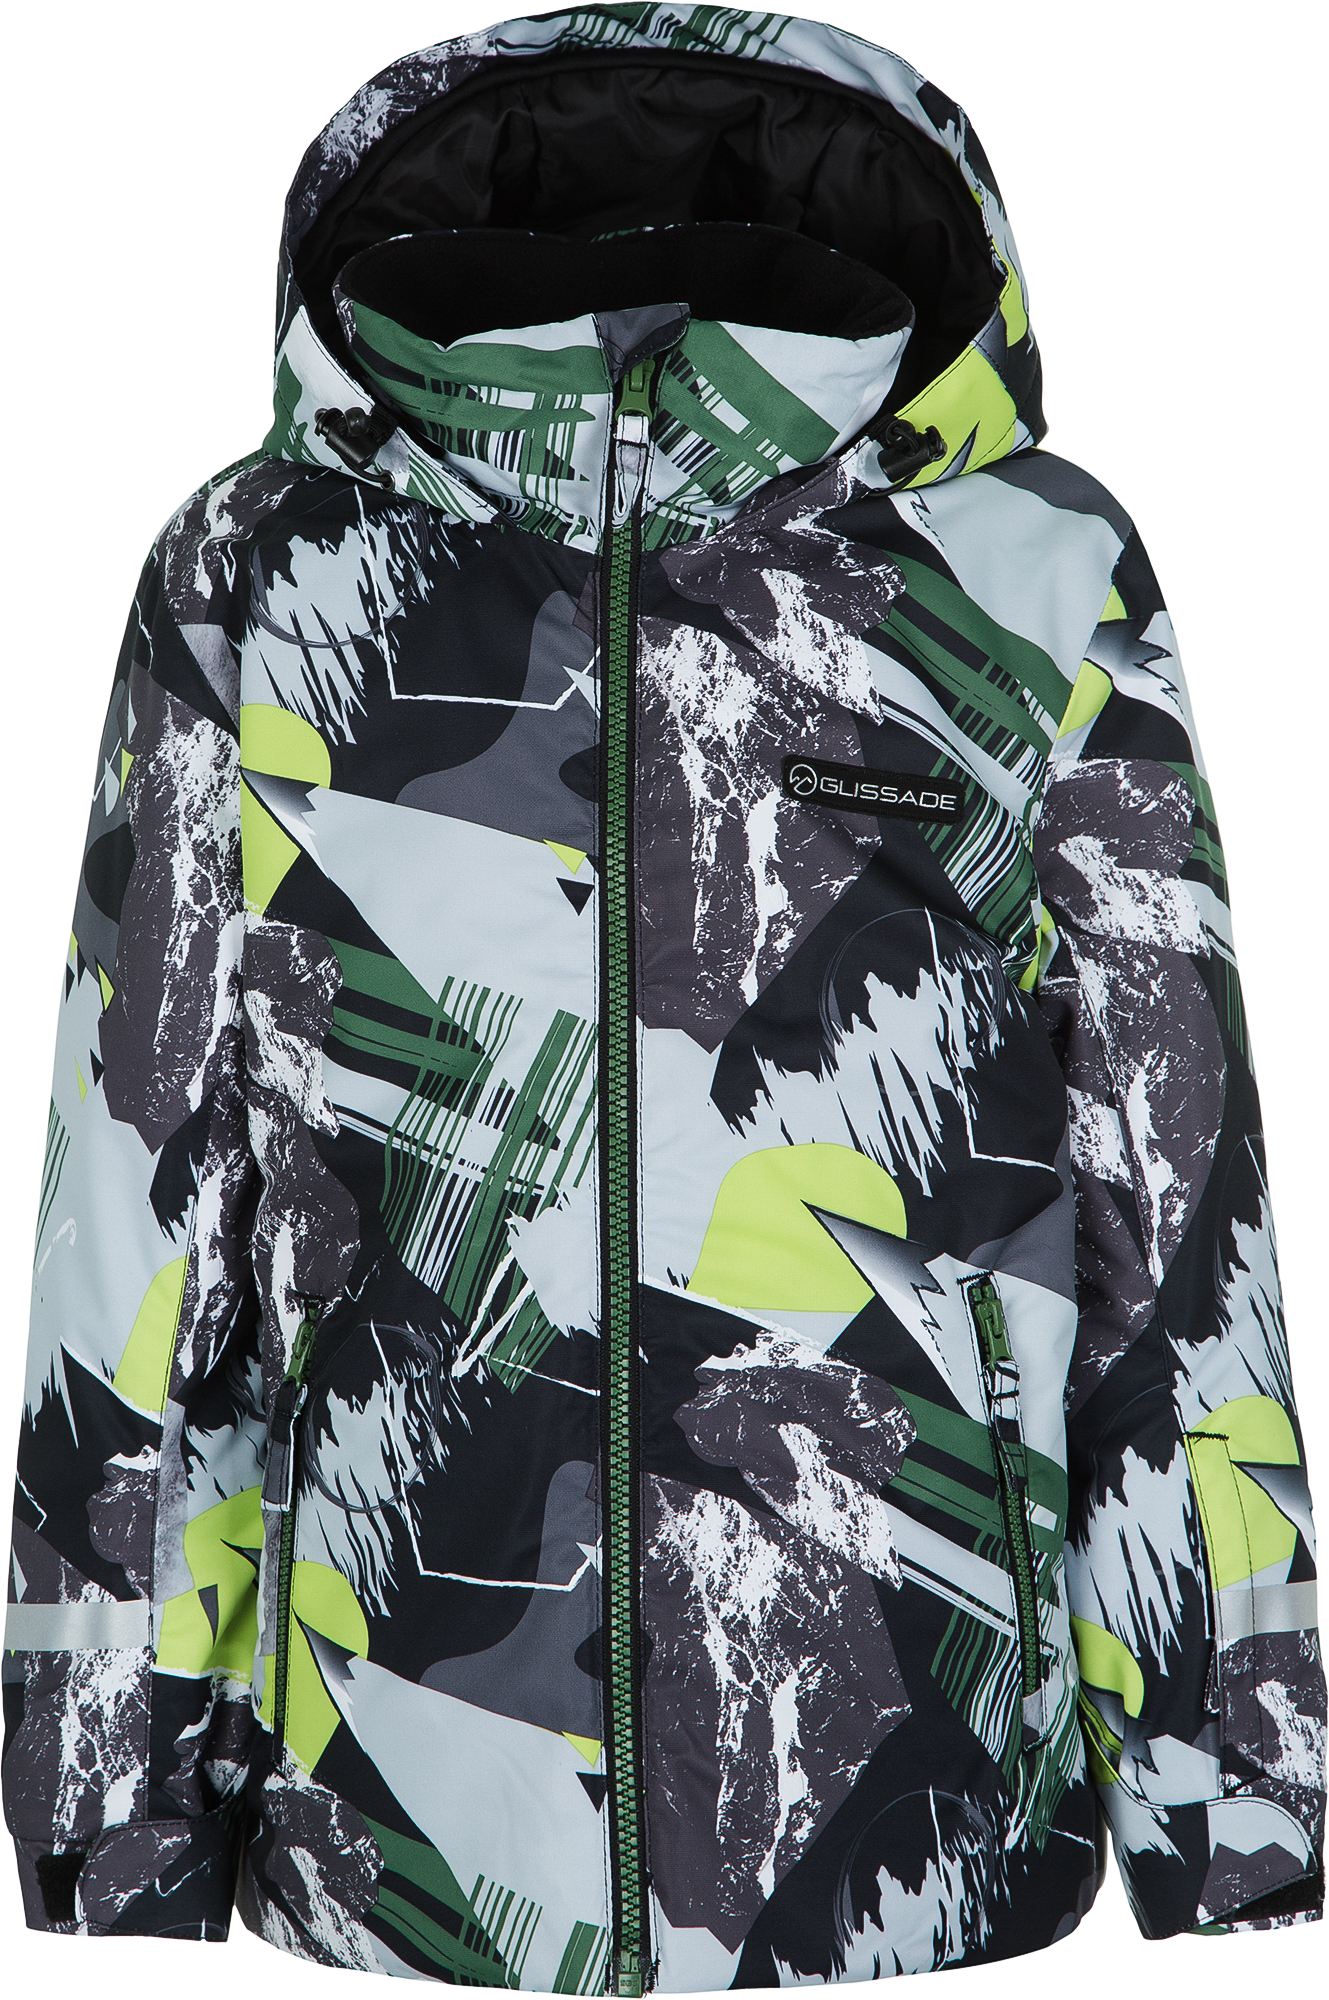 цены Glissade Куртка для мальчиков Glissade, размер 116